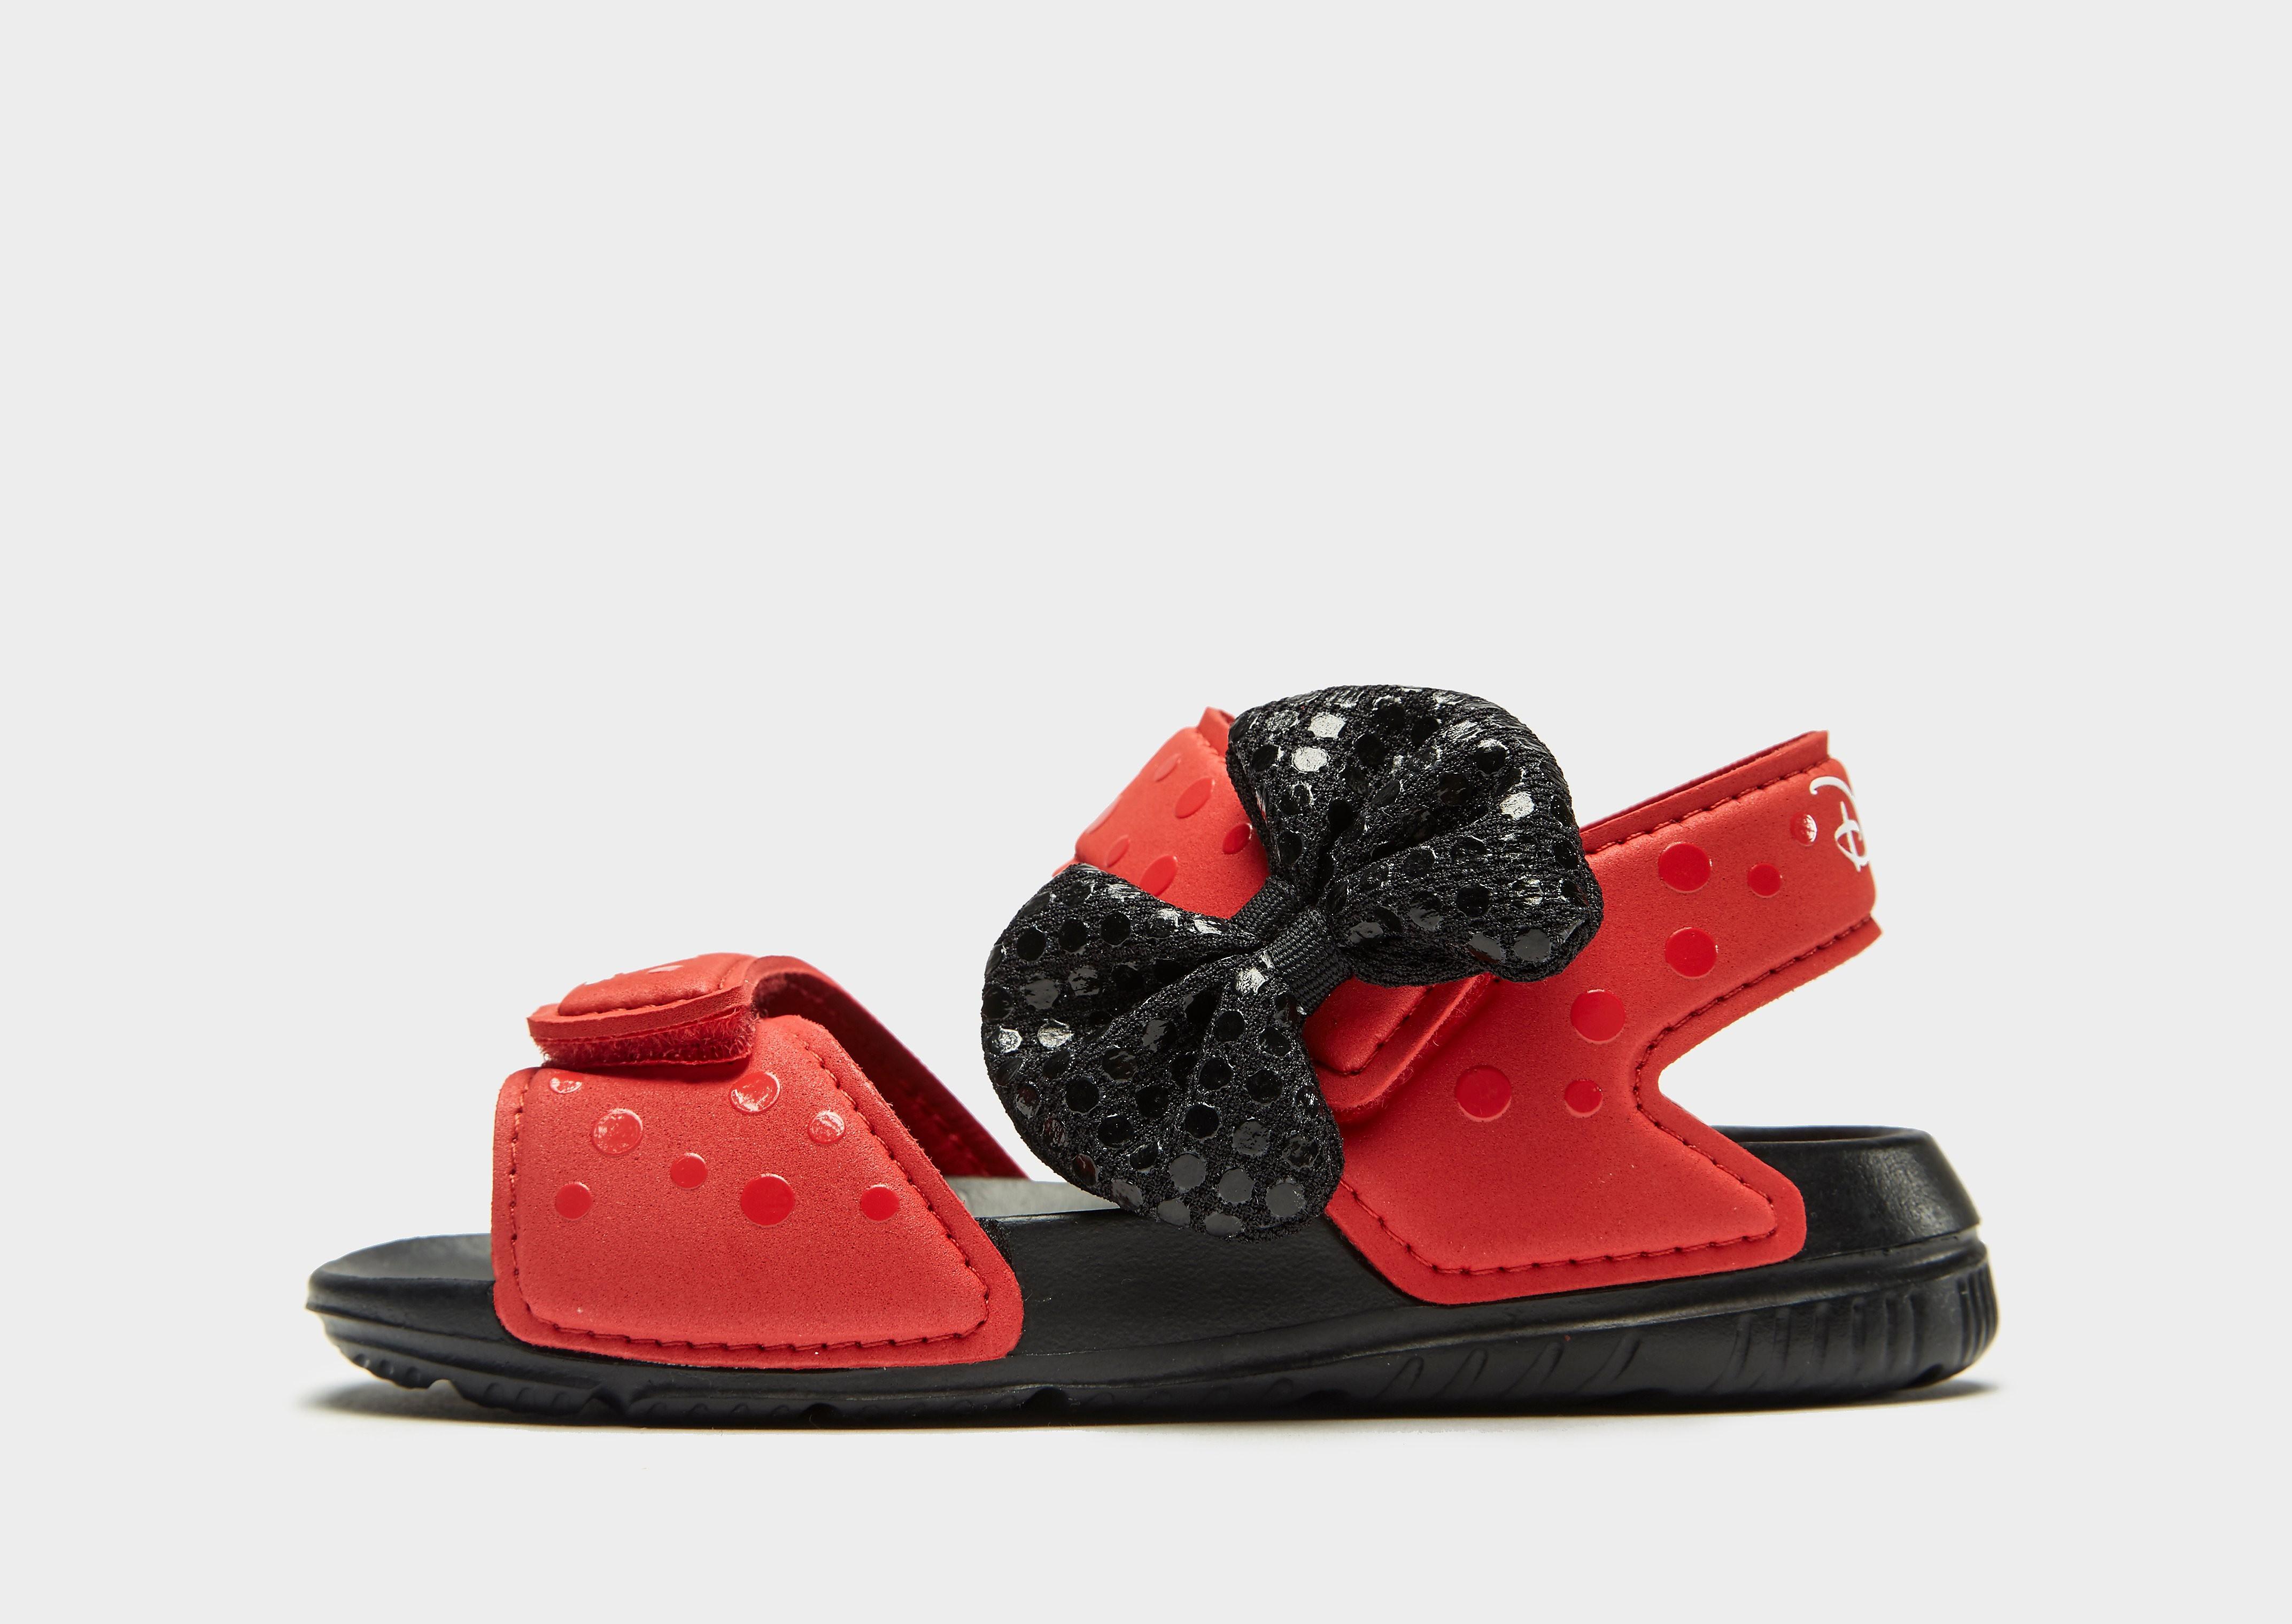 adidas sandalias Disney AltaSwim para bebé